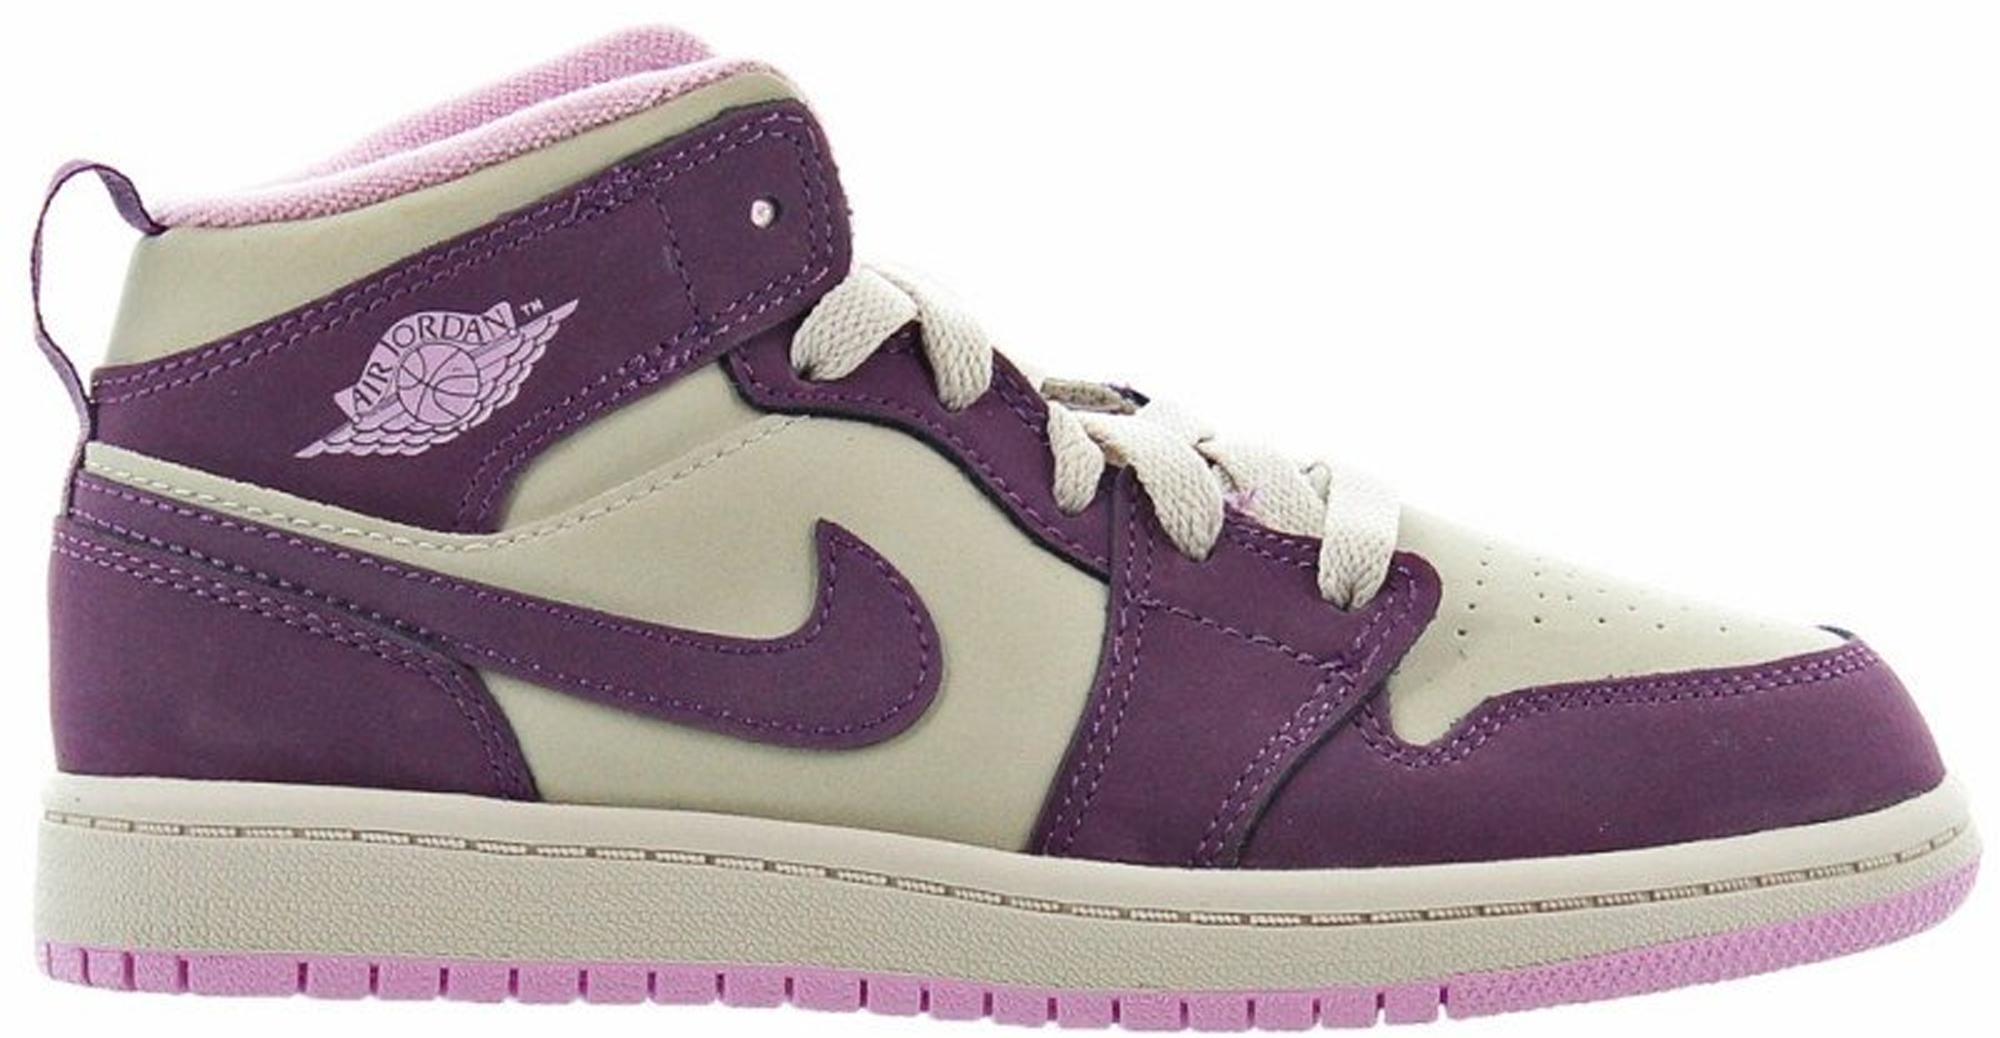 a84b657e7c36 Lyst - Nike 1 Mid Pro Purple Desert Sand (ps) in Purple for Men